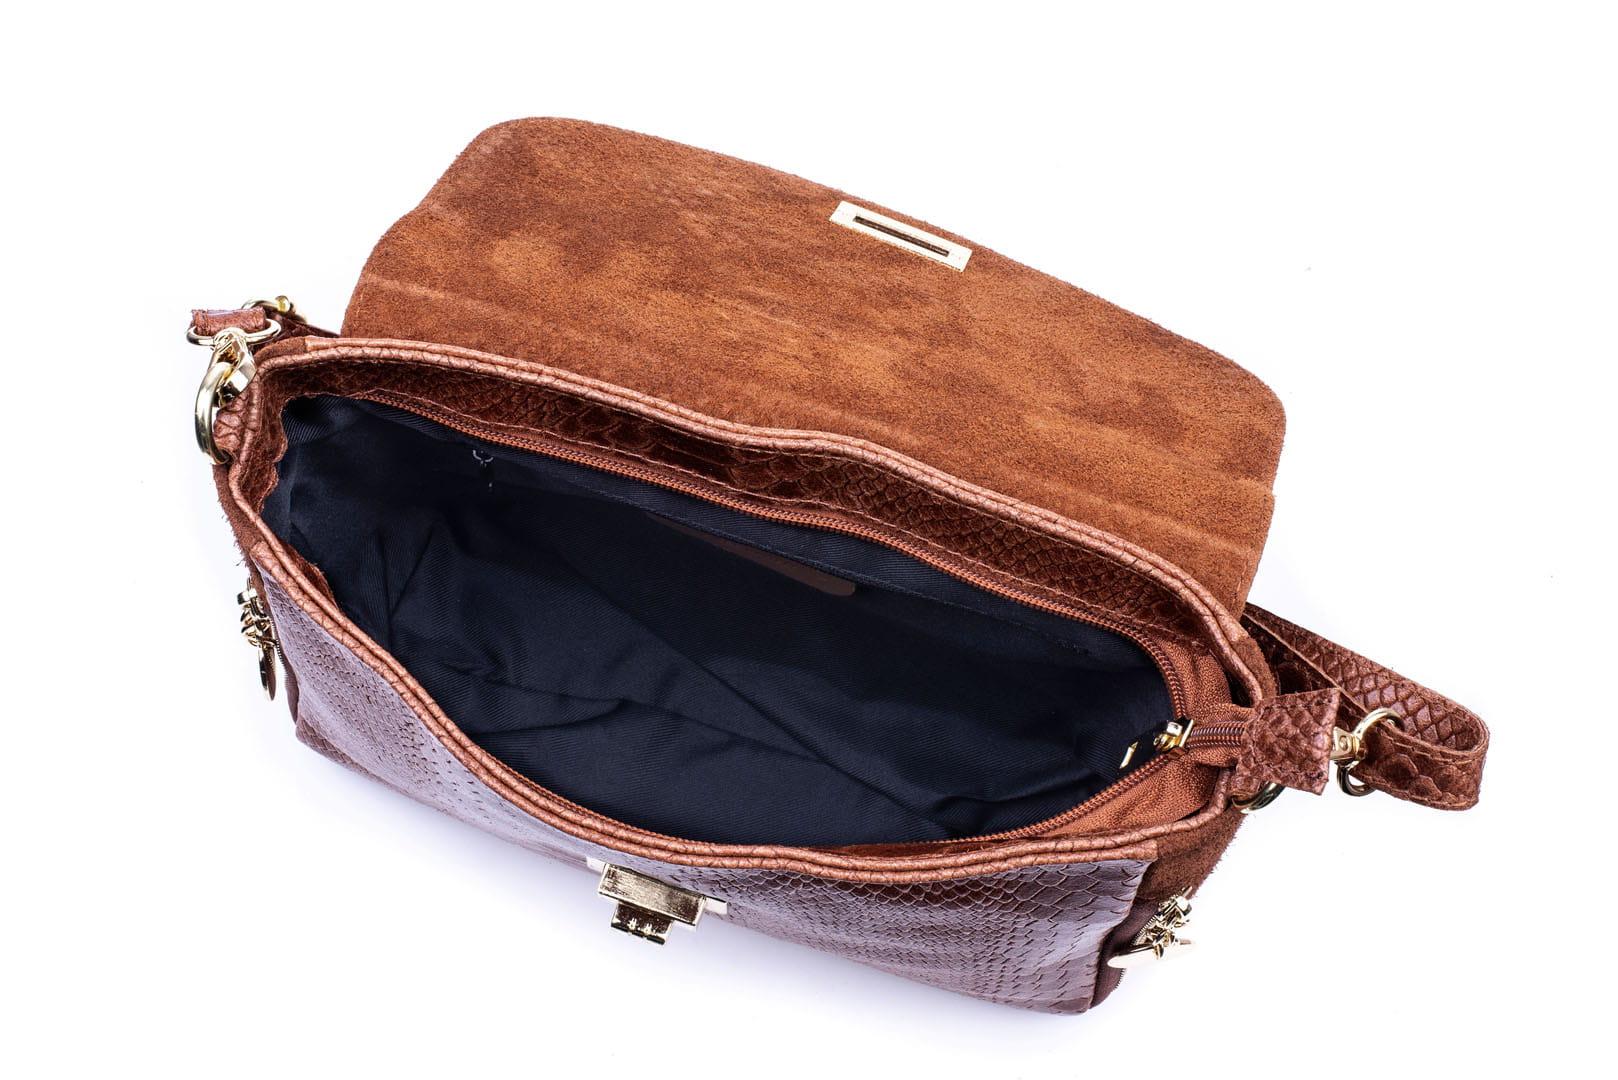 3f9f19bca5811 Torebka Damska Skórzana Vera Pelle Łuski Koniak Leather Box